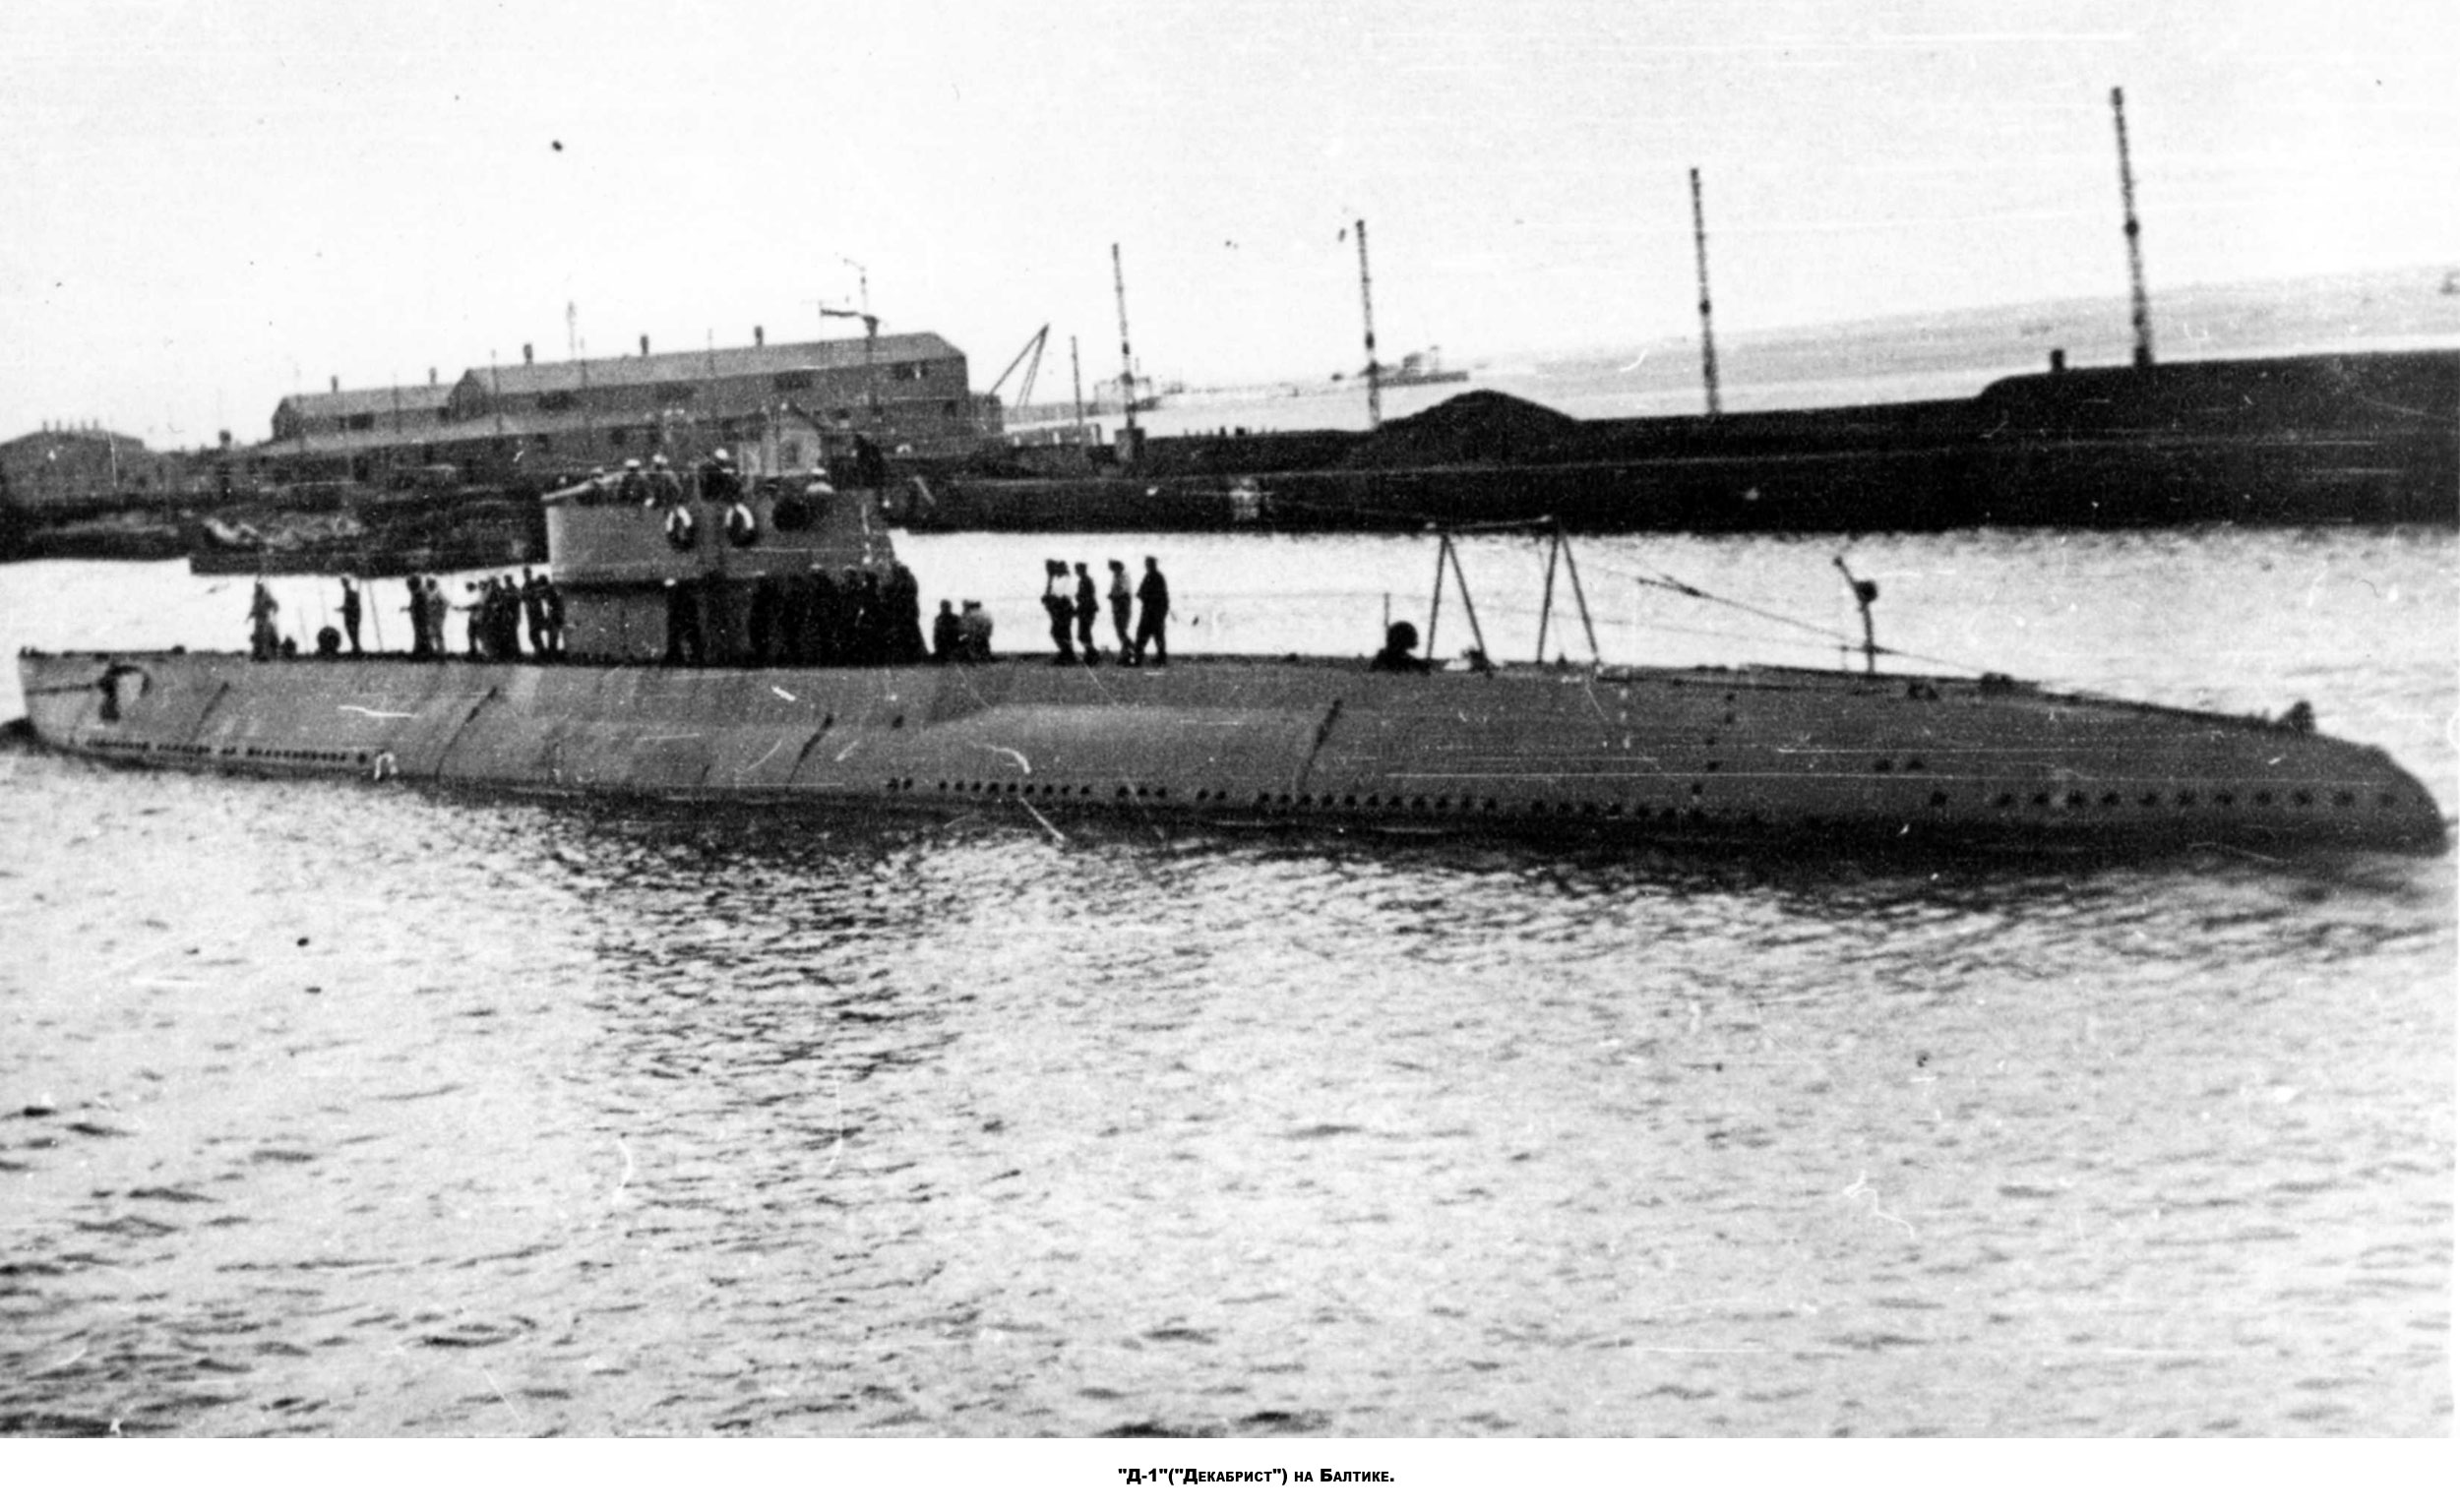 http://www.navy.su/navysub191745/d/images/d-1_04.jpg